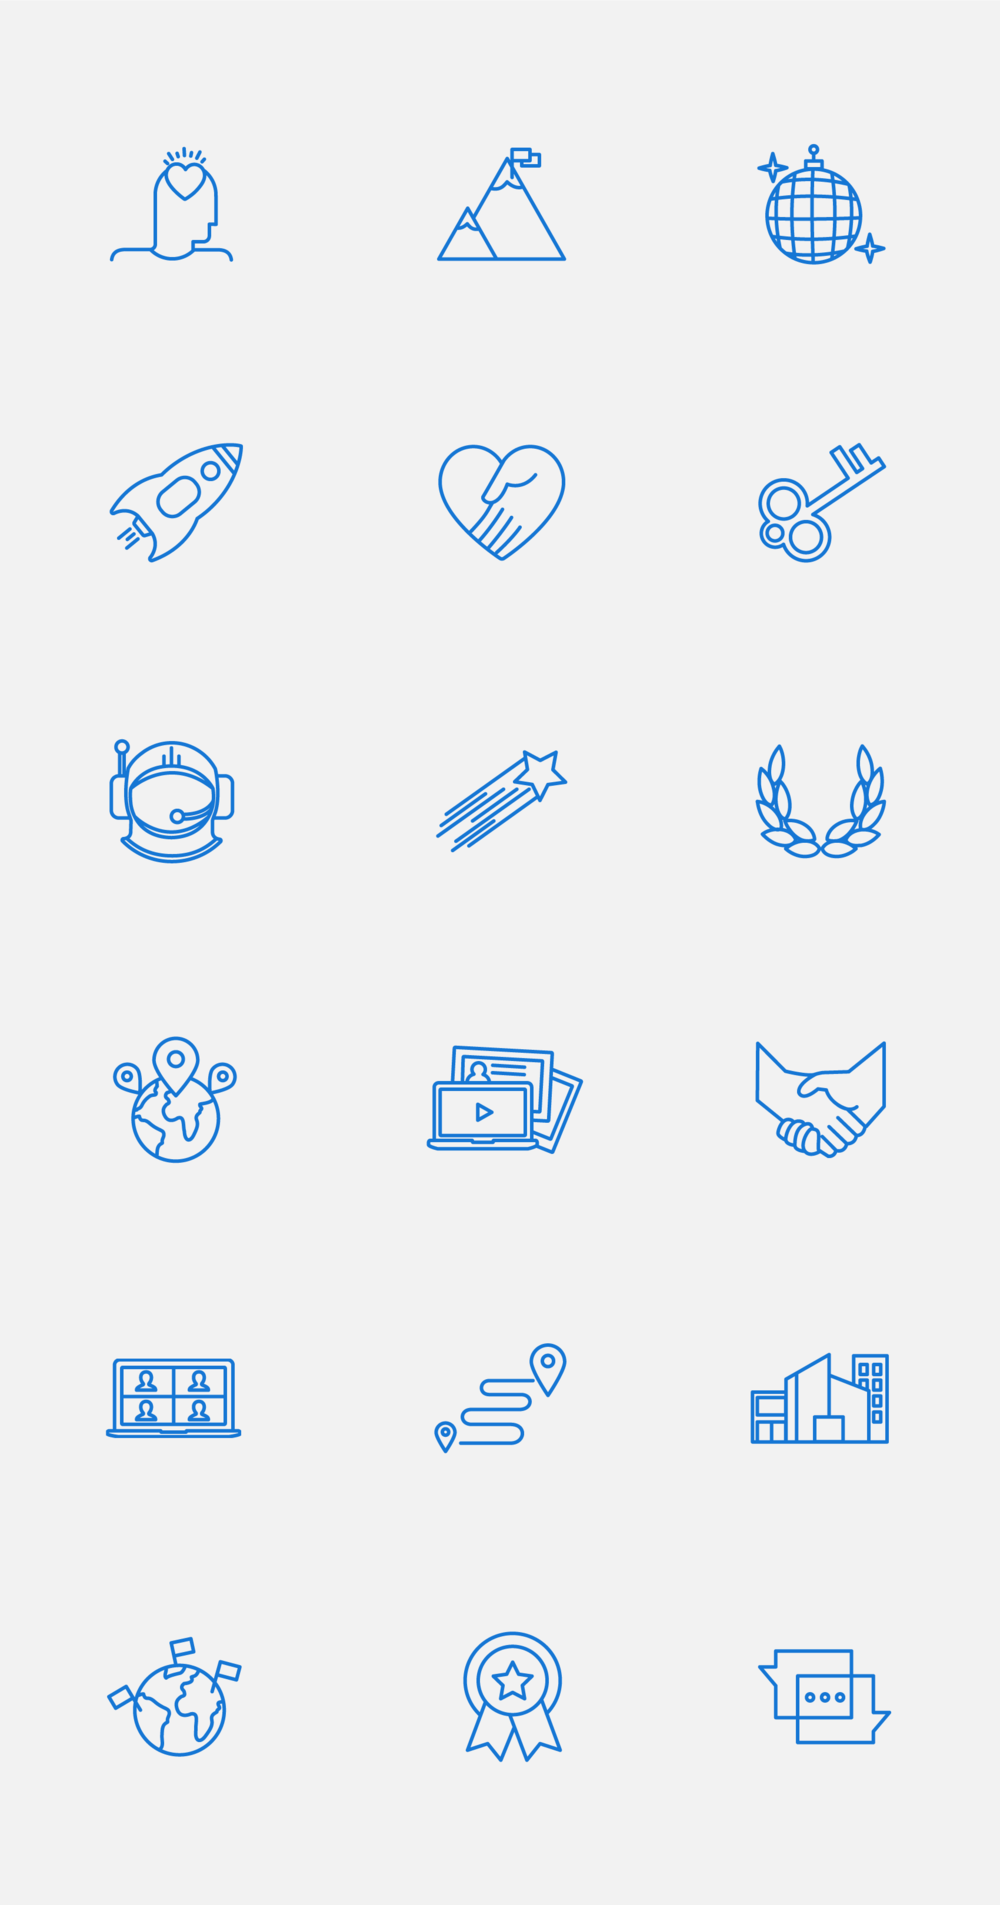 Full Icon Pack for 2U